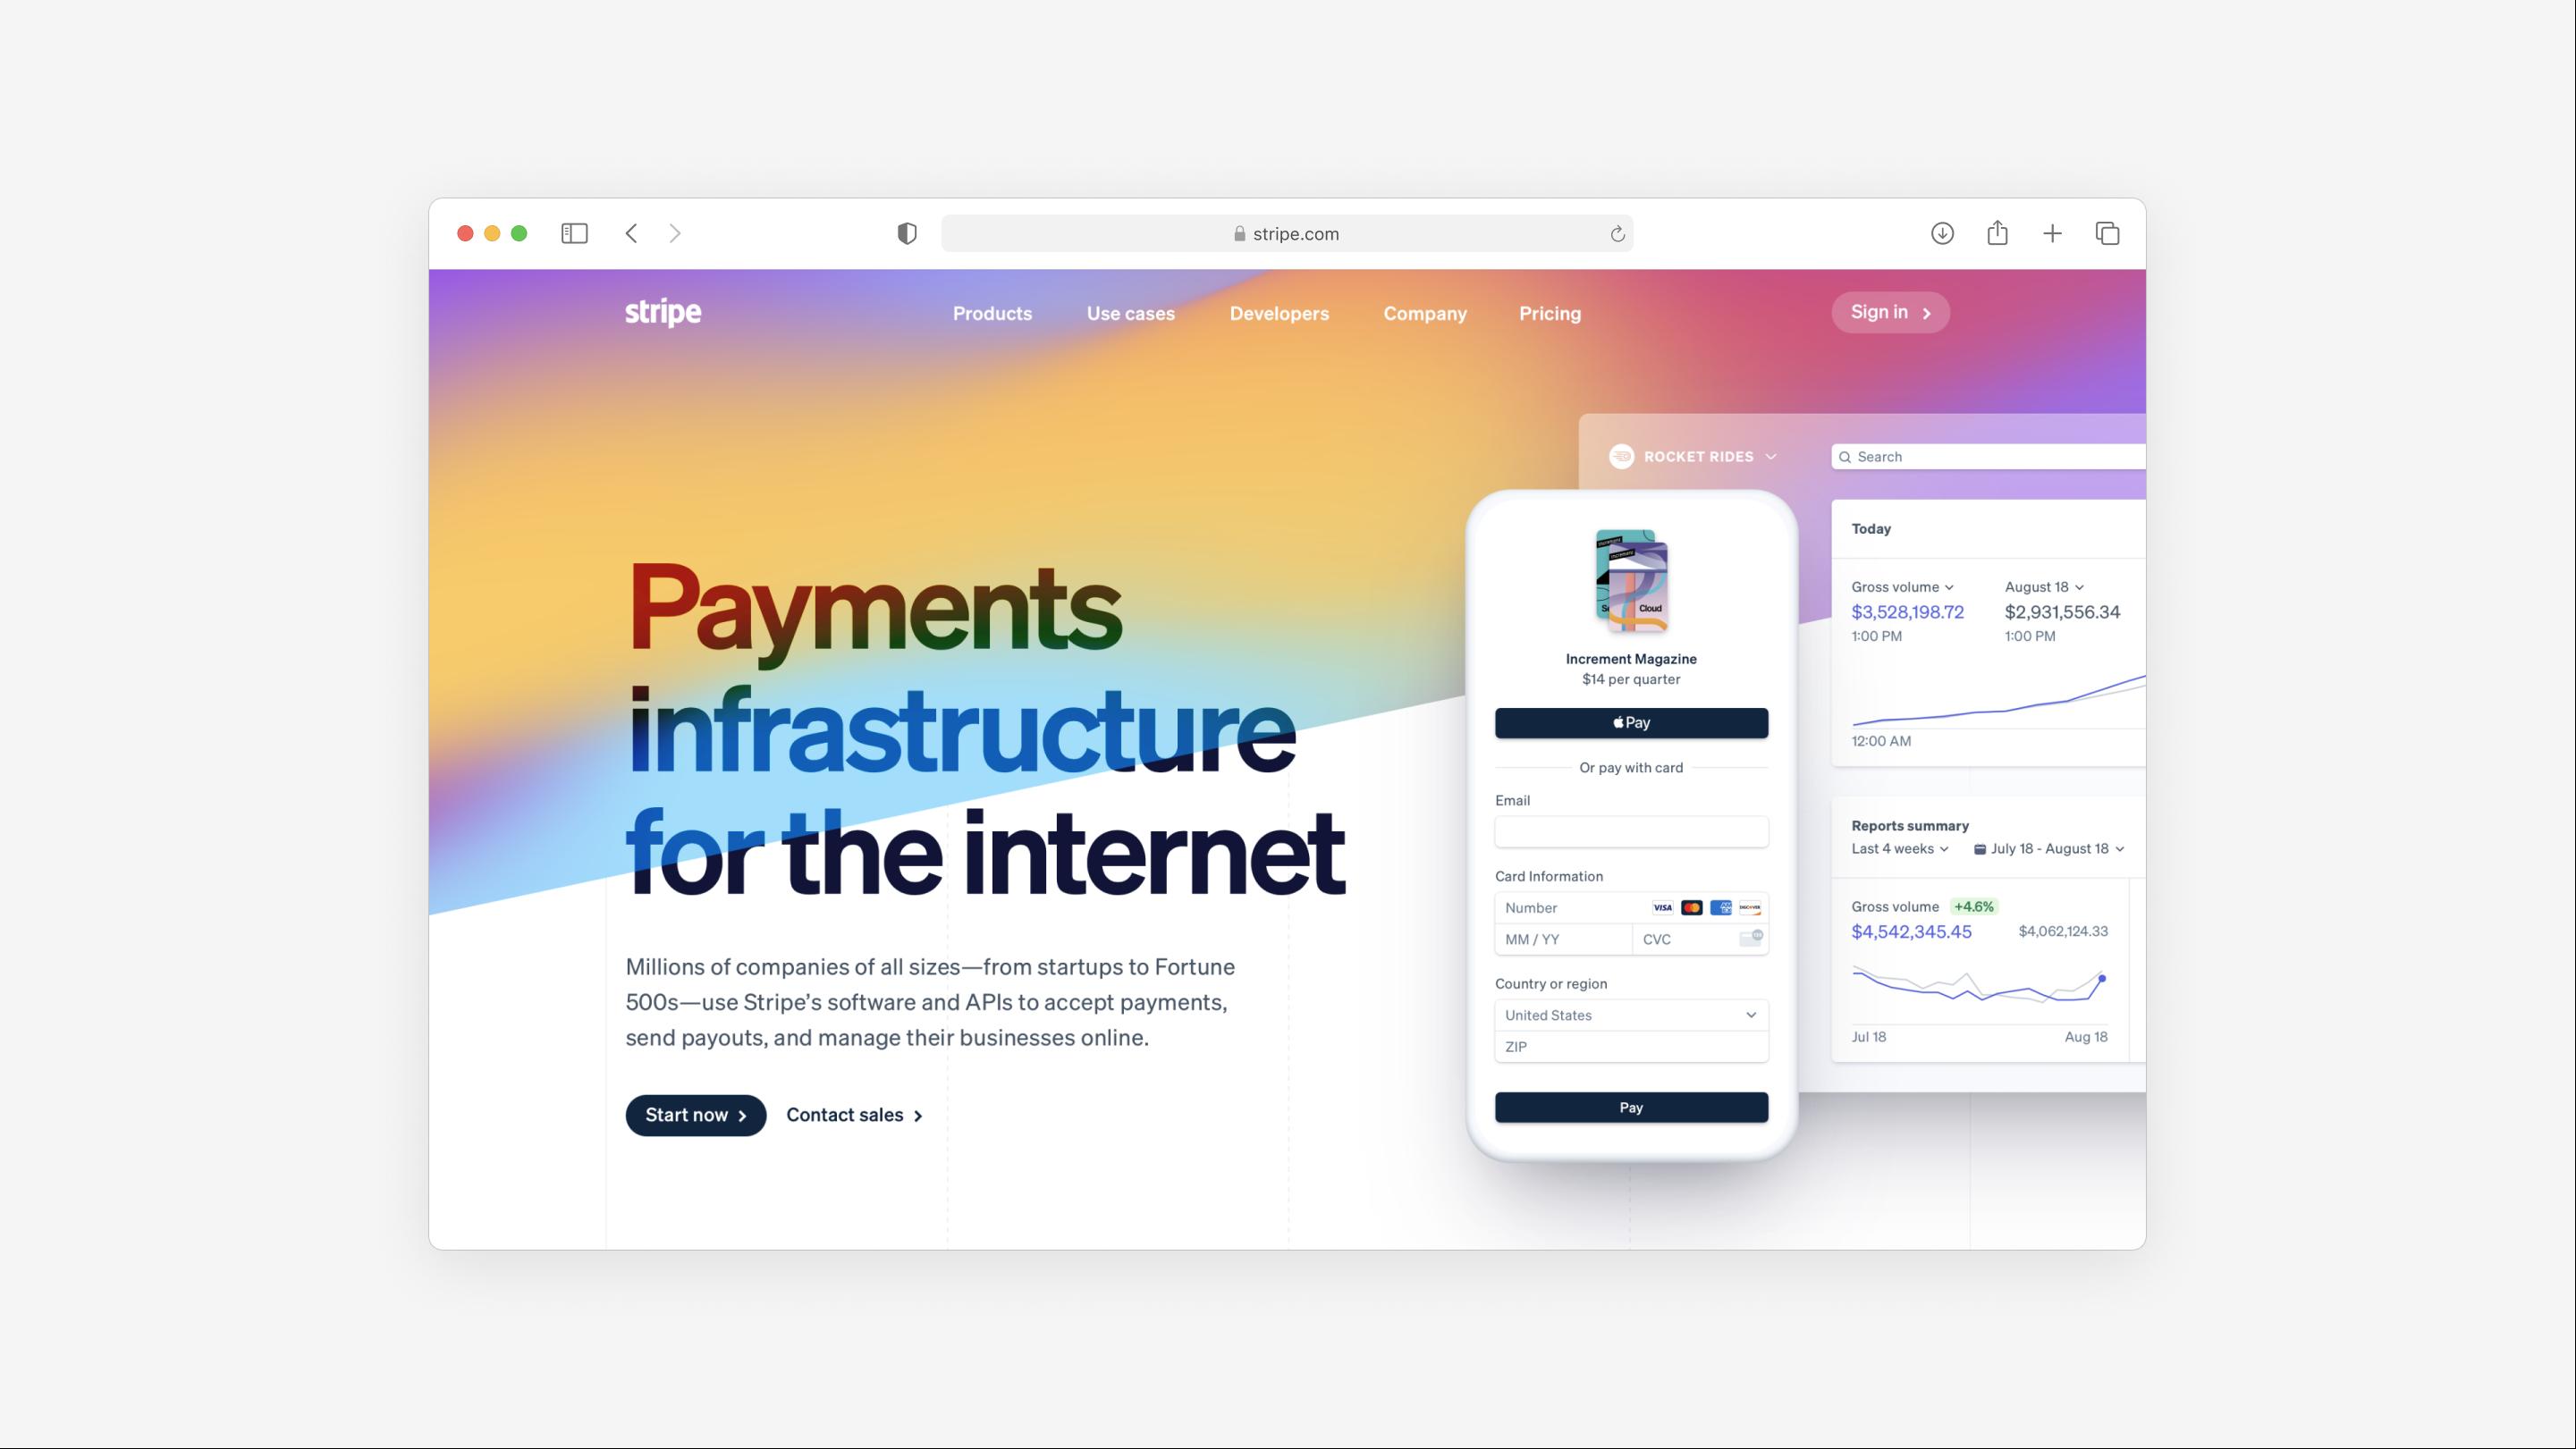 the website for Stripe is a straightforward B2B website